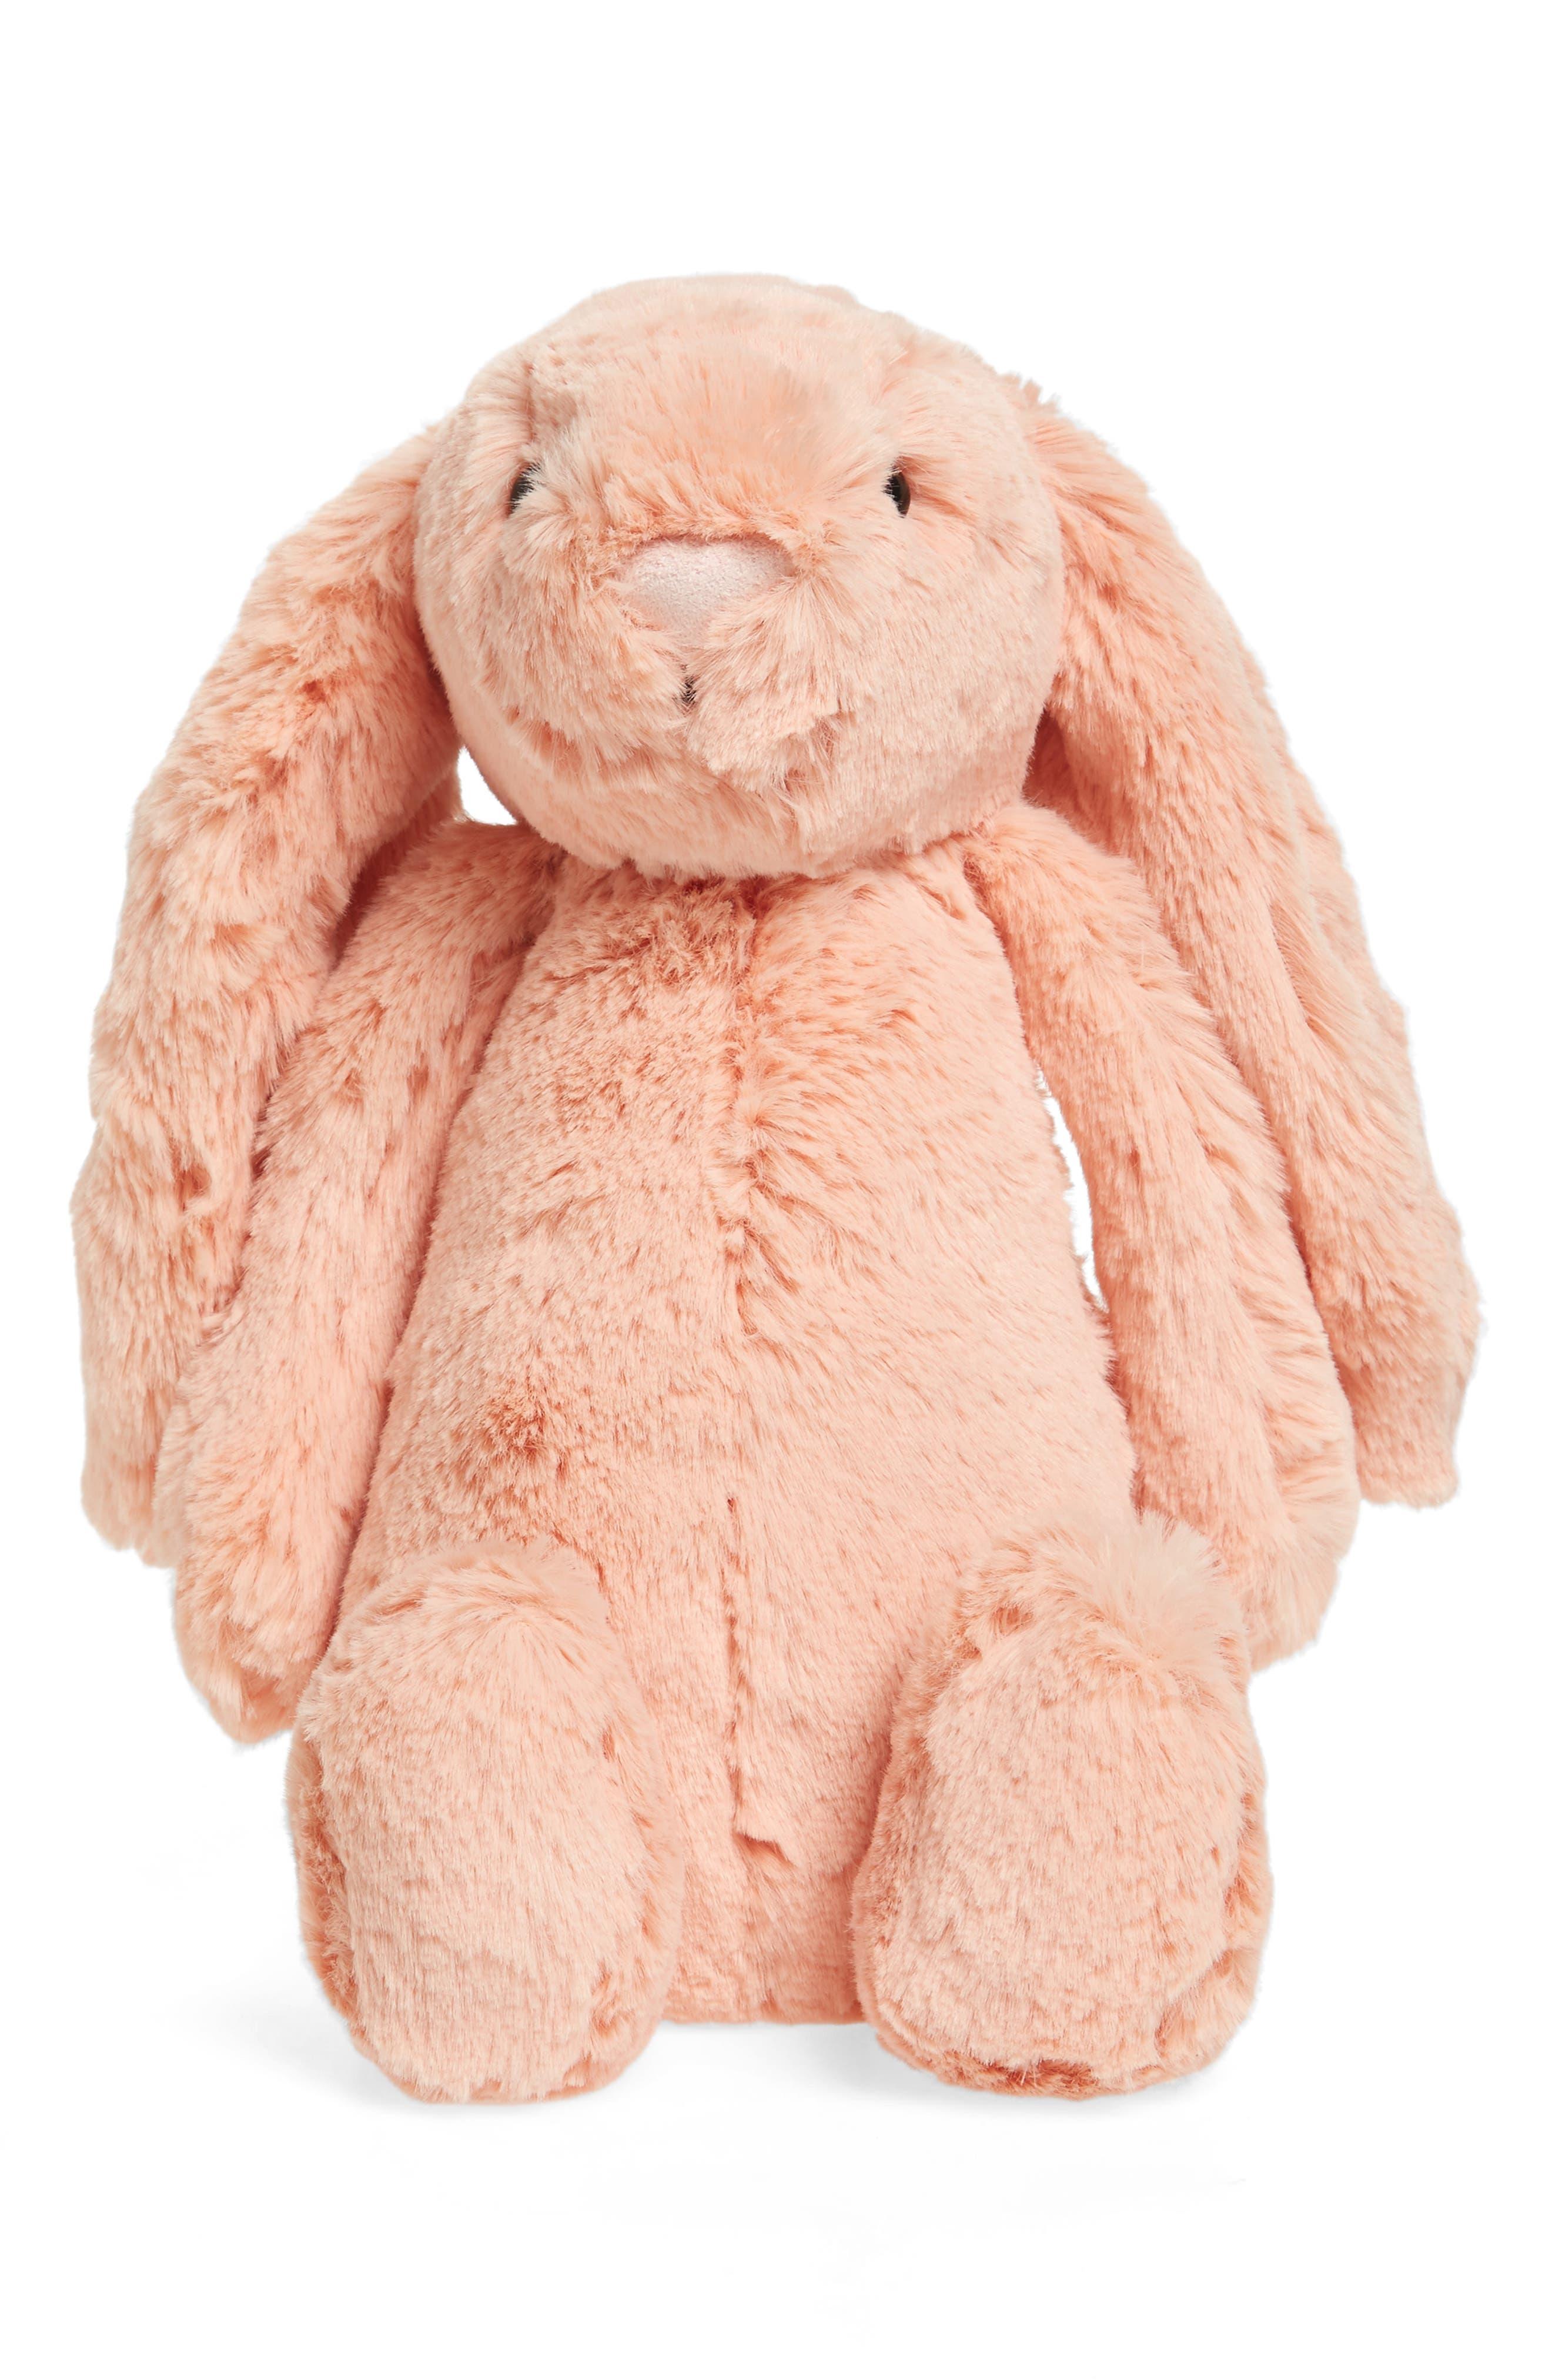 Jellycat Medium Bashful Bunny Stuffed Animal